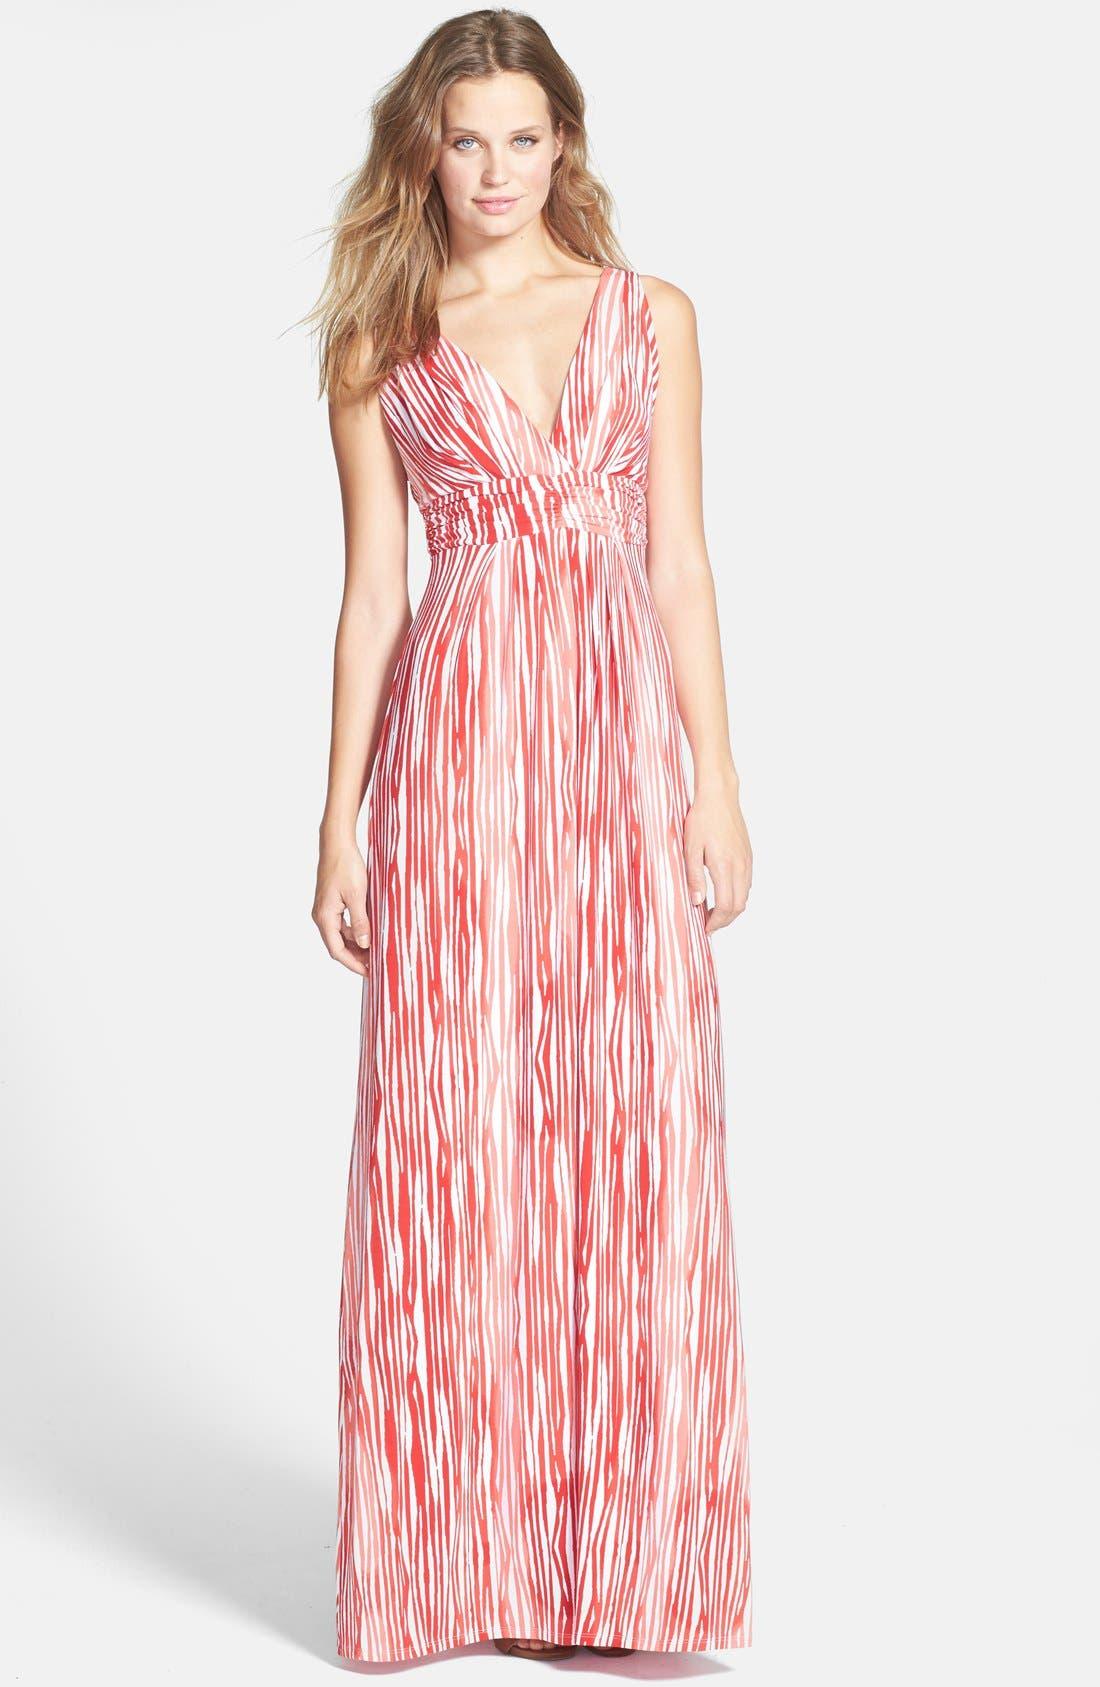 Alternate Image 1 Selected - Tart 'Adrianna' Surplice Print Jersey Maxi Dress